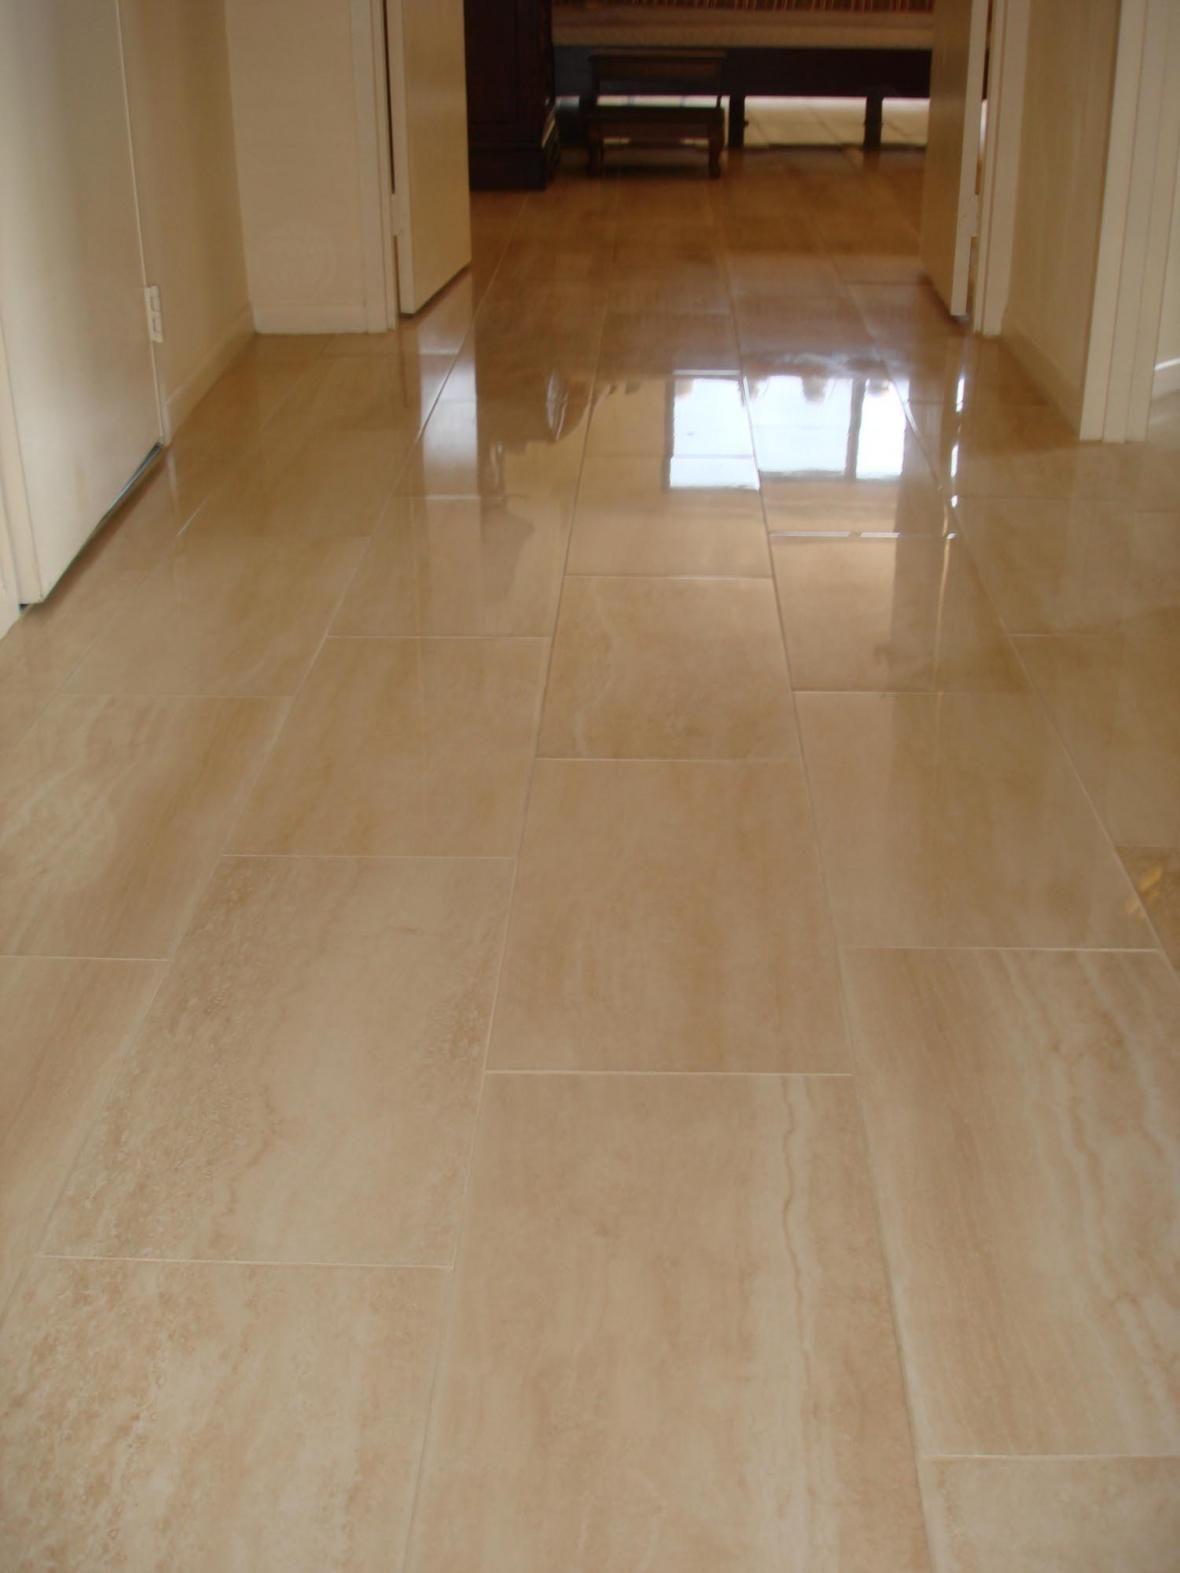 porcelain flooring  Porcelain tile floor in hallway